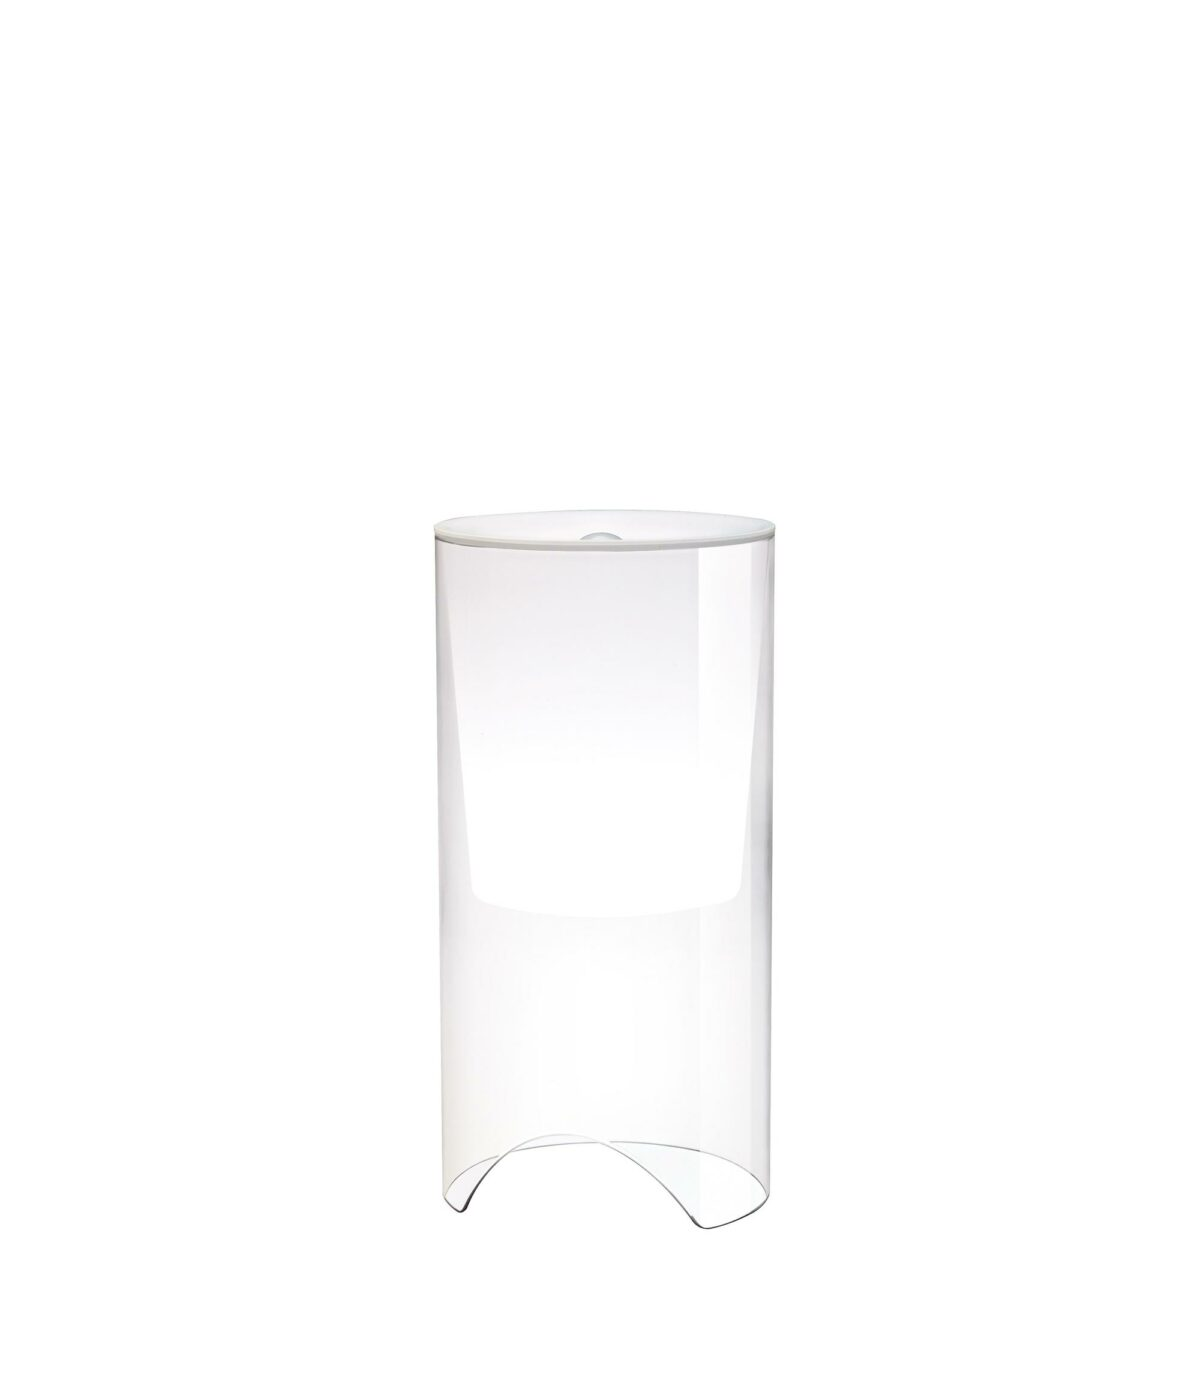 aoy table castiglioni flos